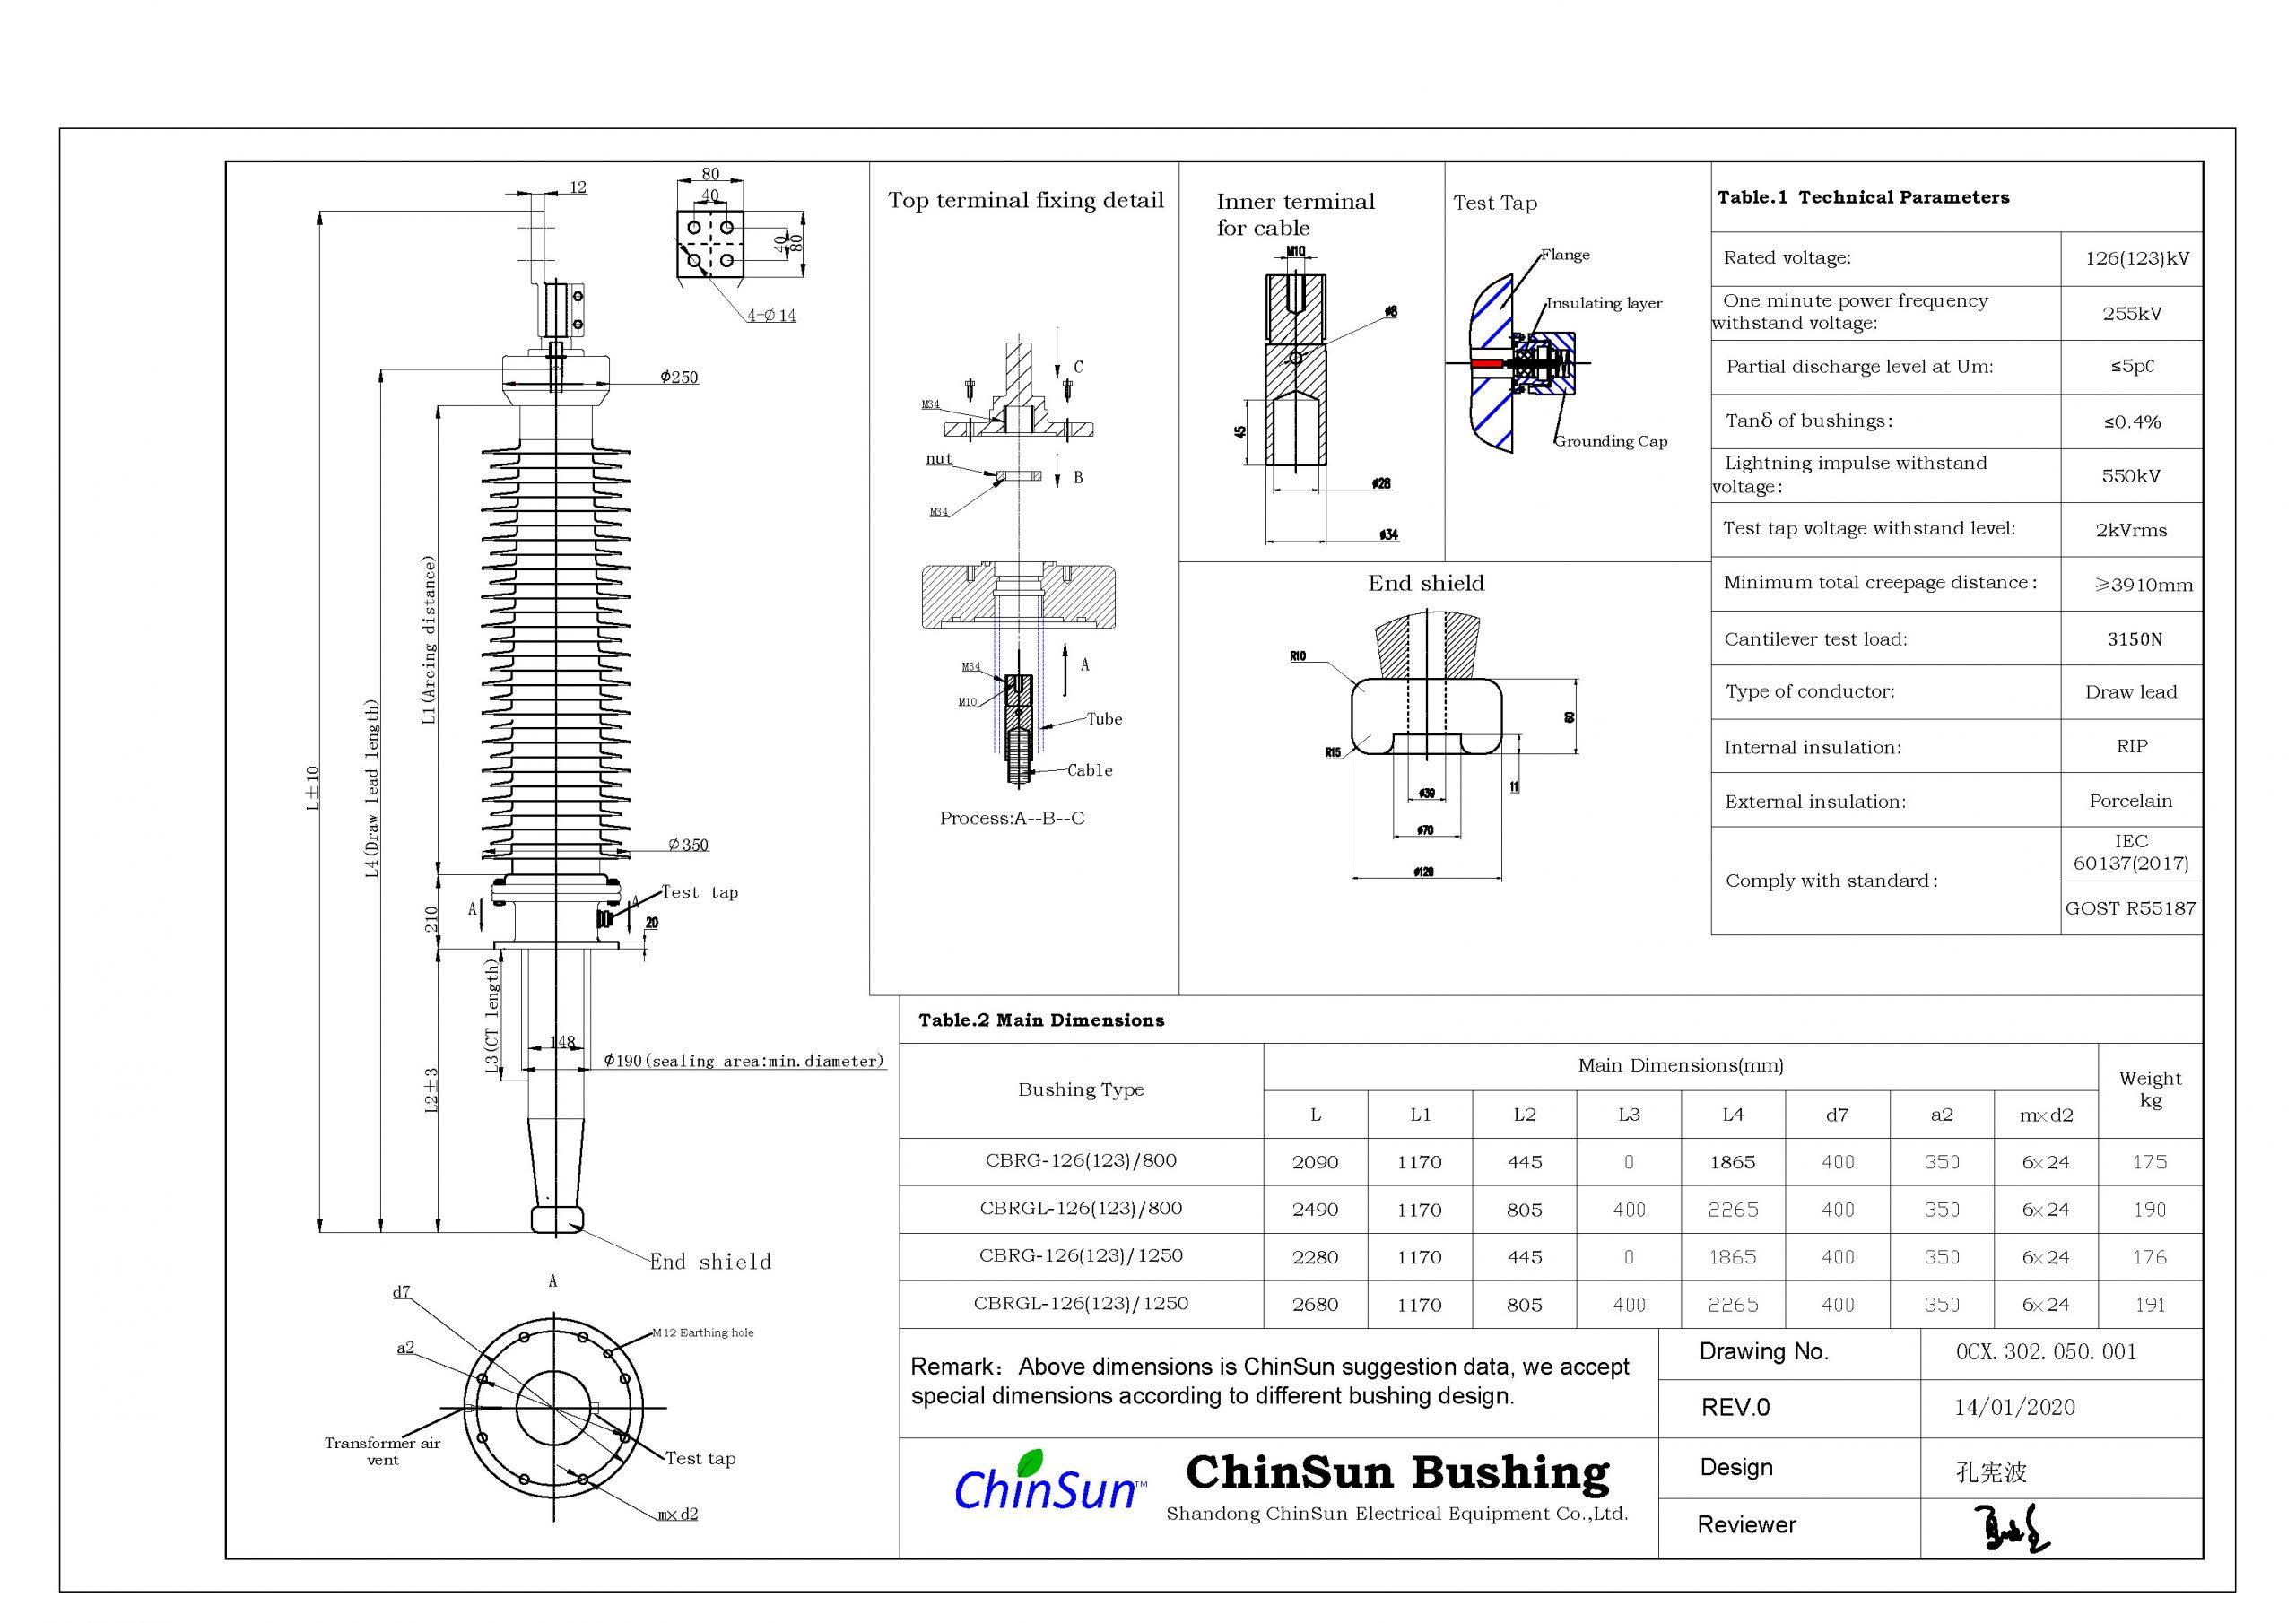 Drawing-transformer bushing-126(123)kV_Porcelain-DL-ChinSun